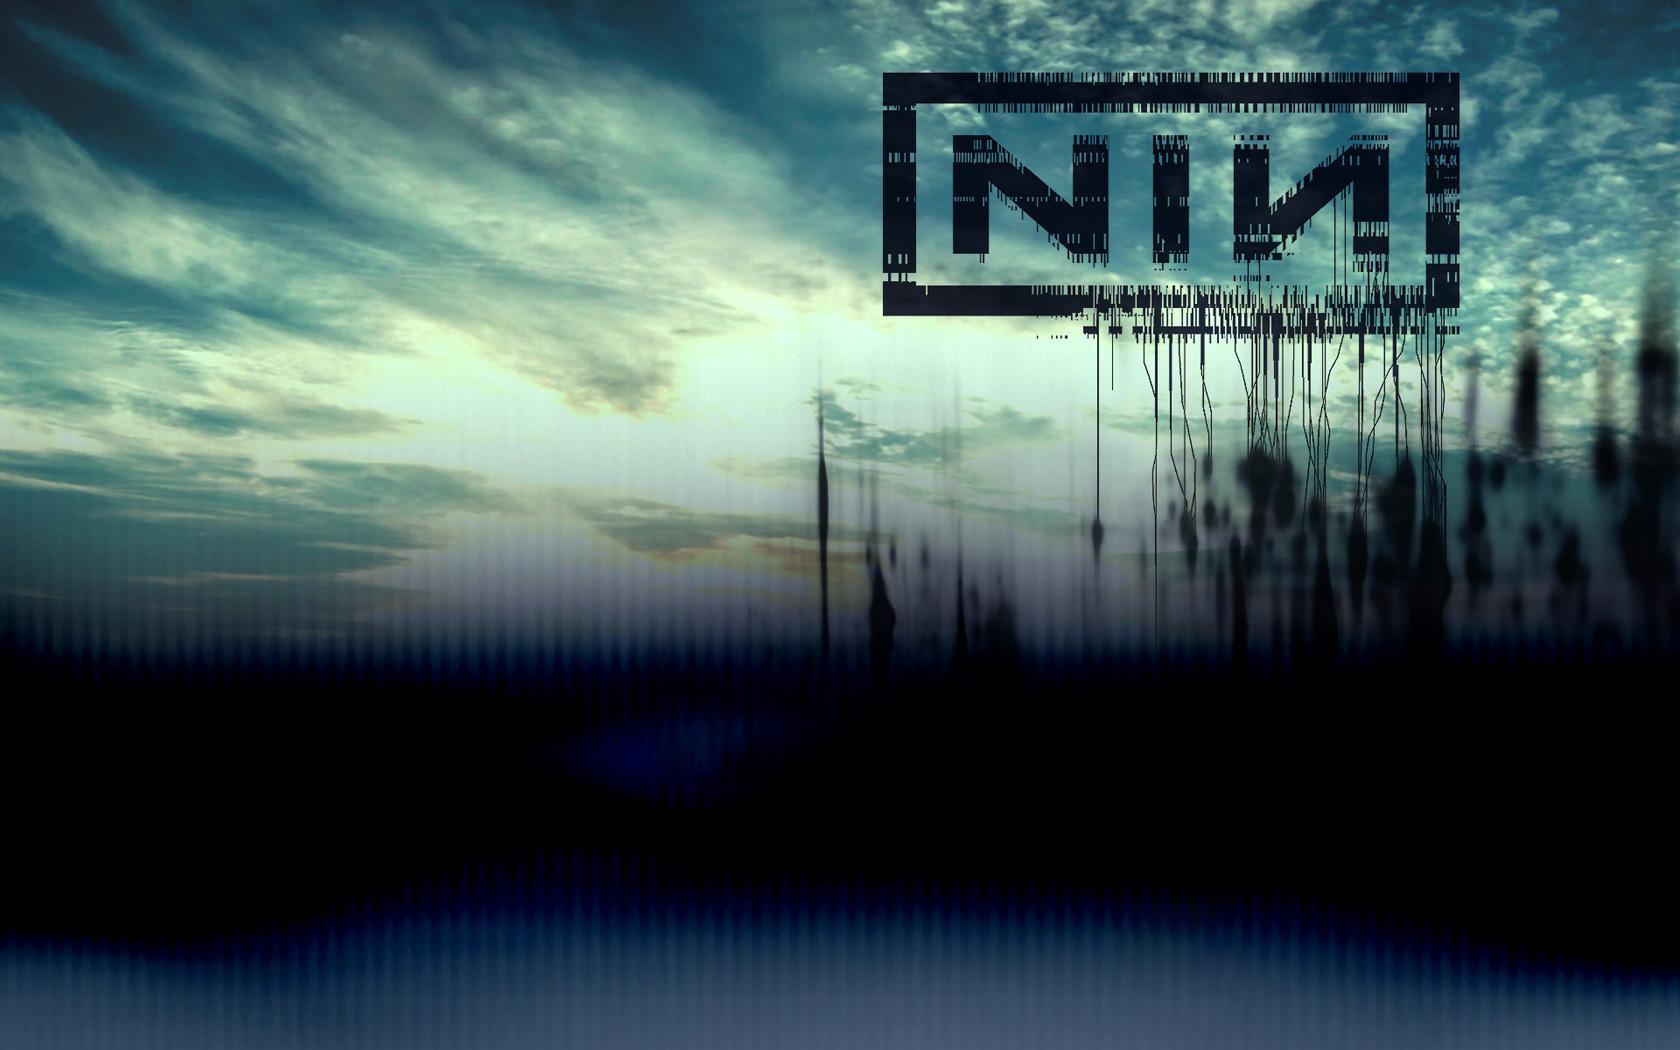 Nine Inch Nails - Starsuckers